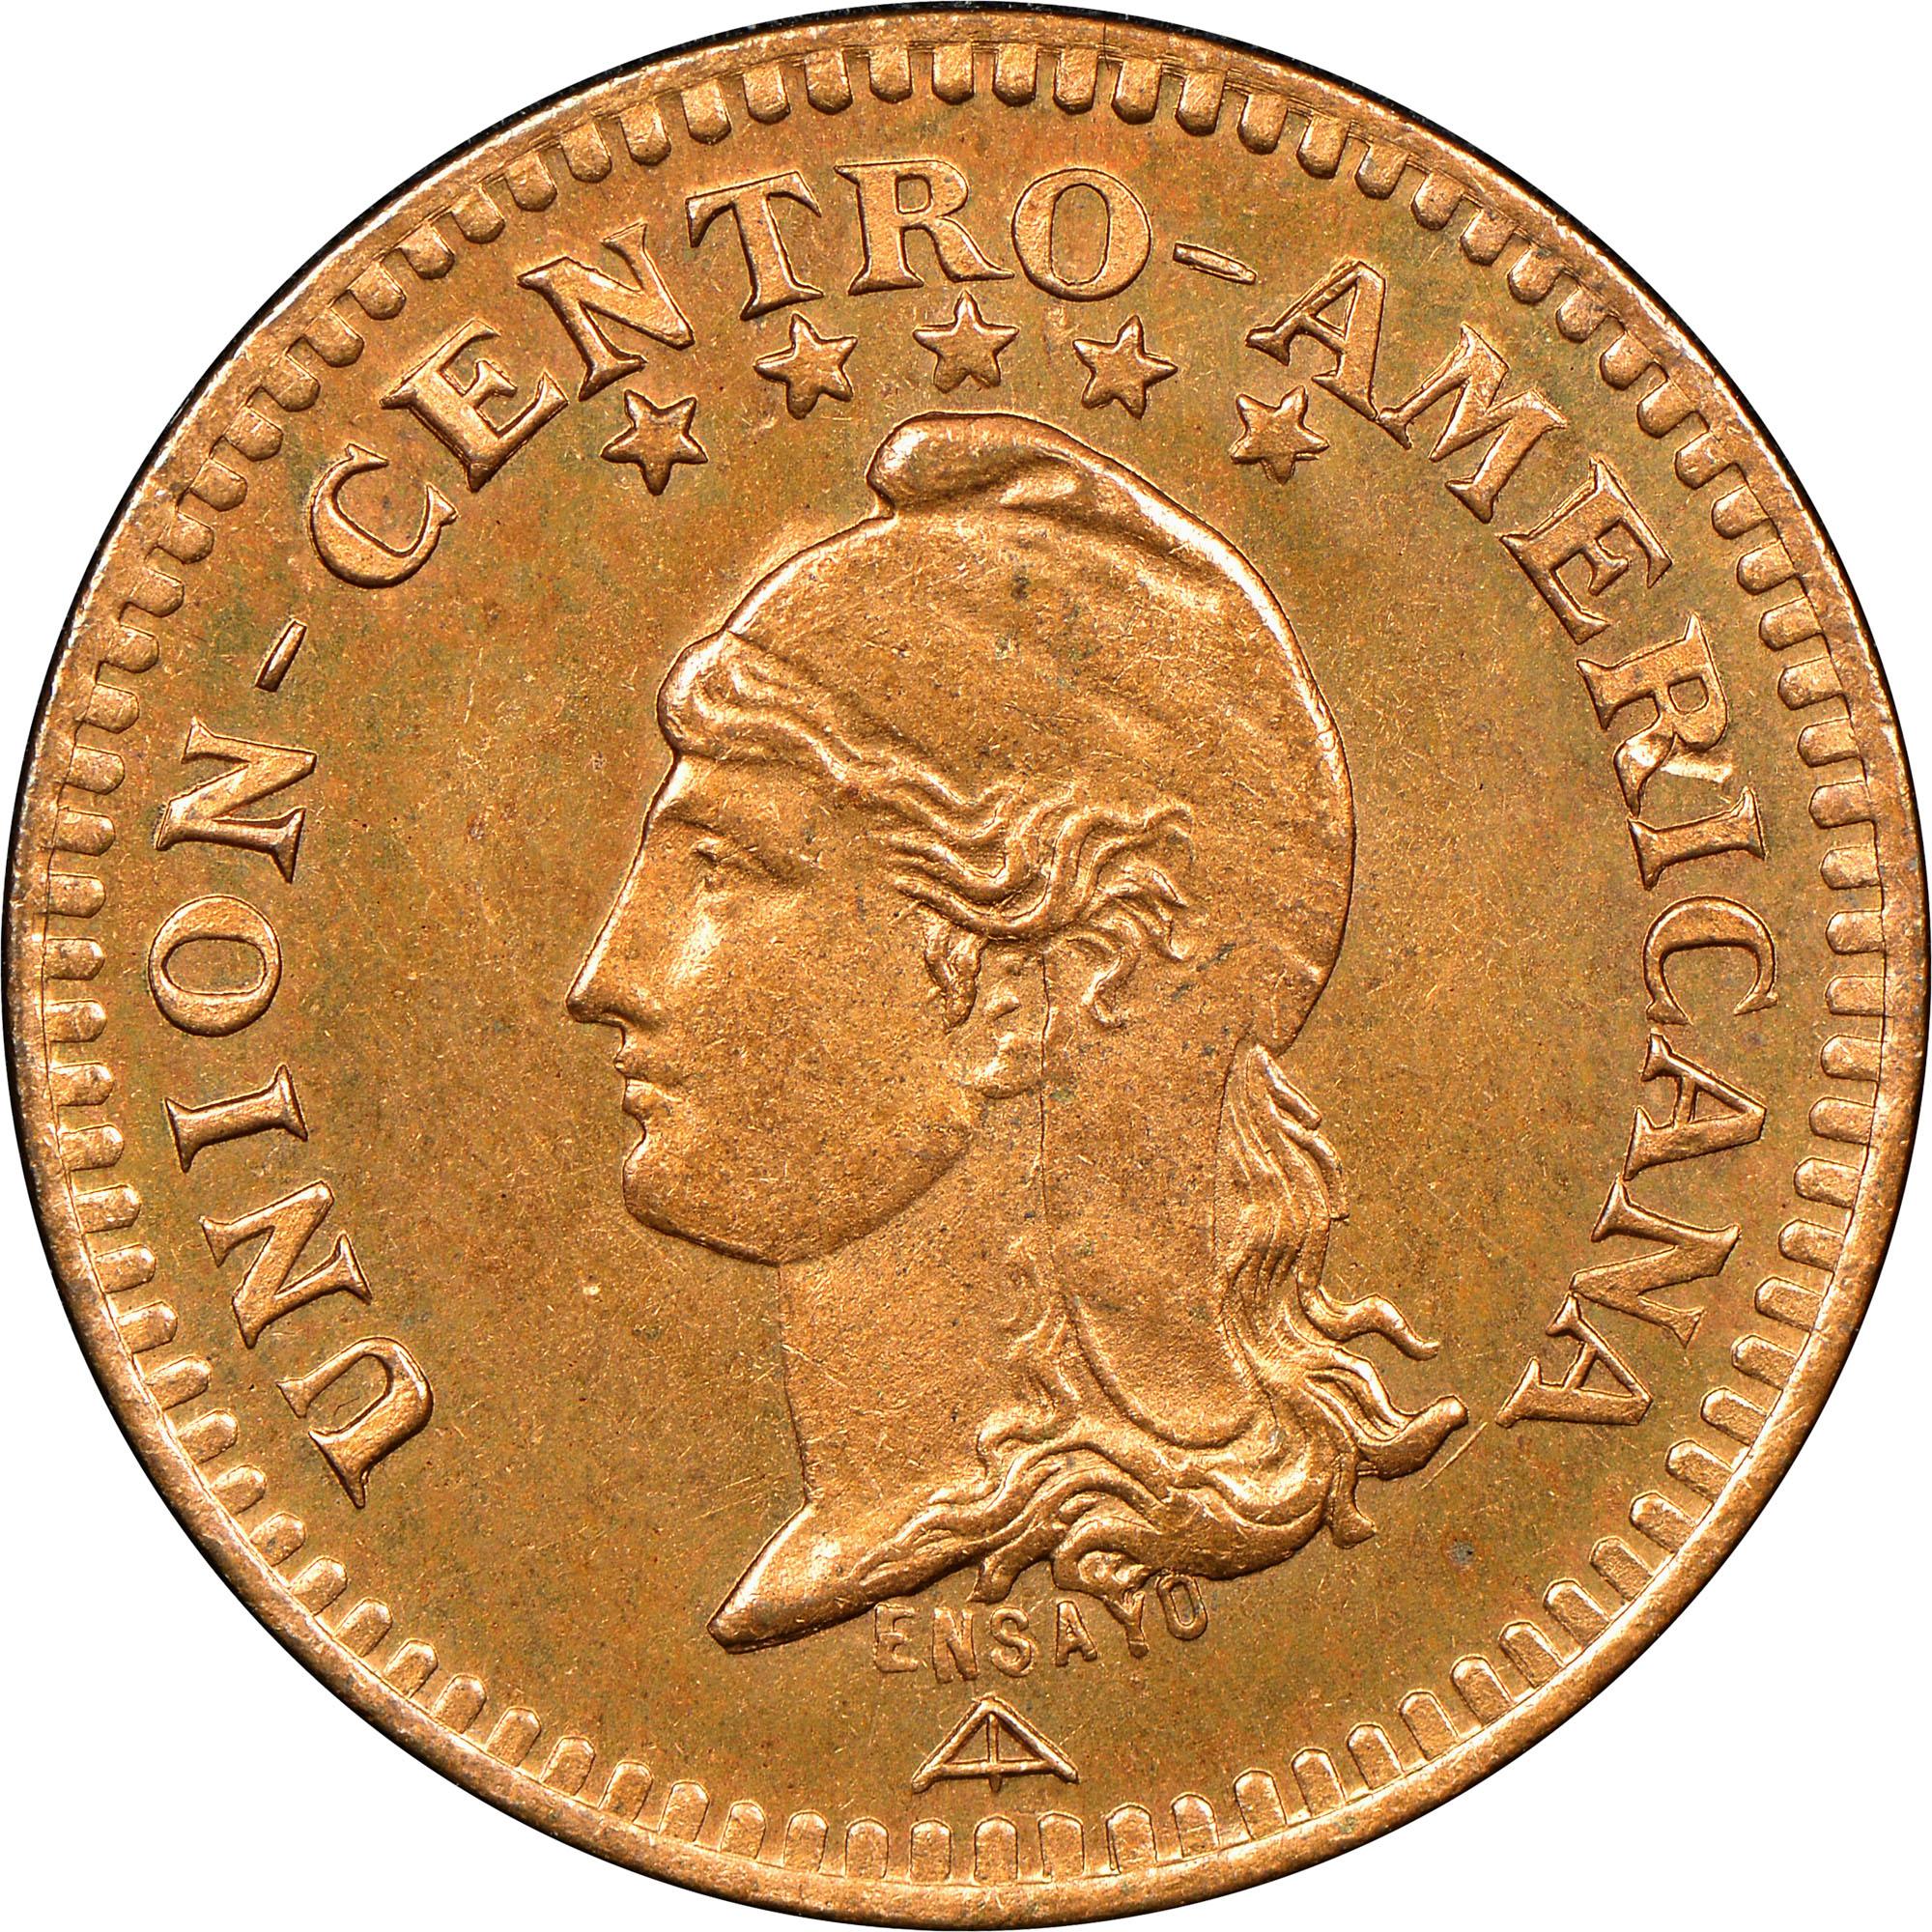 1889 Central American Union Centavo obverse